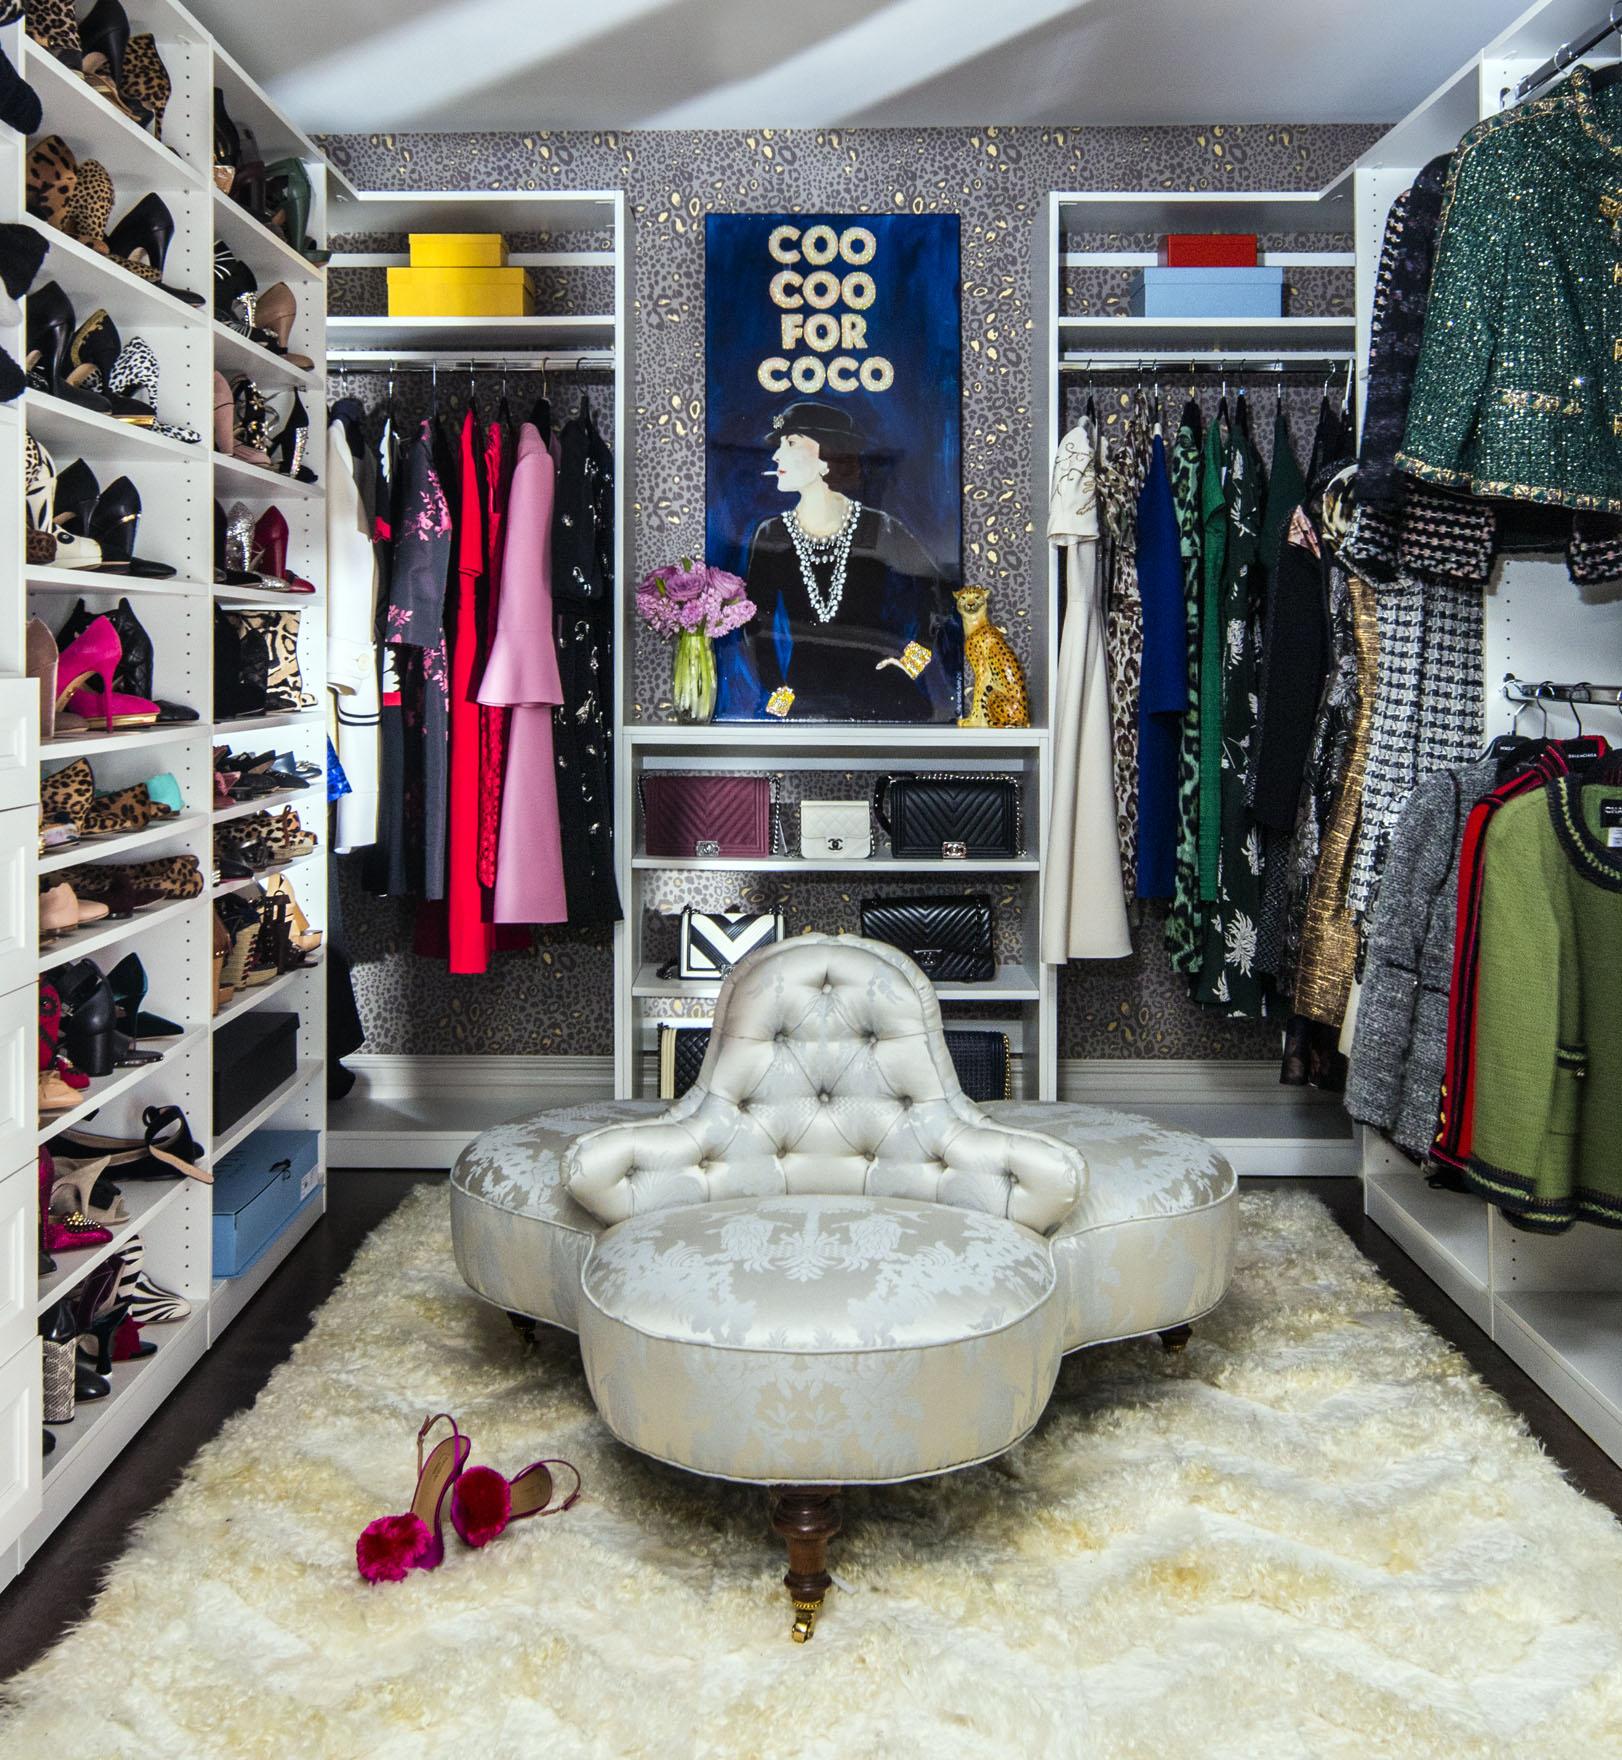 coco-closet-cropped-2.jpg